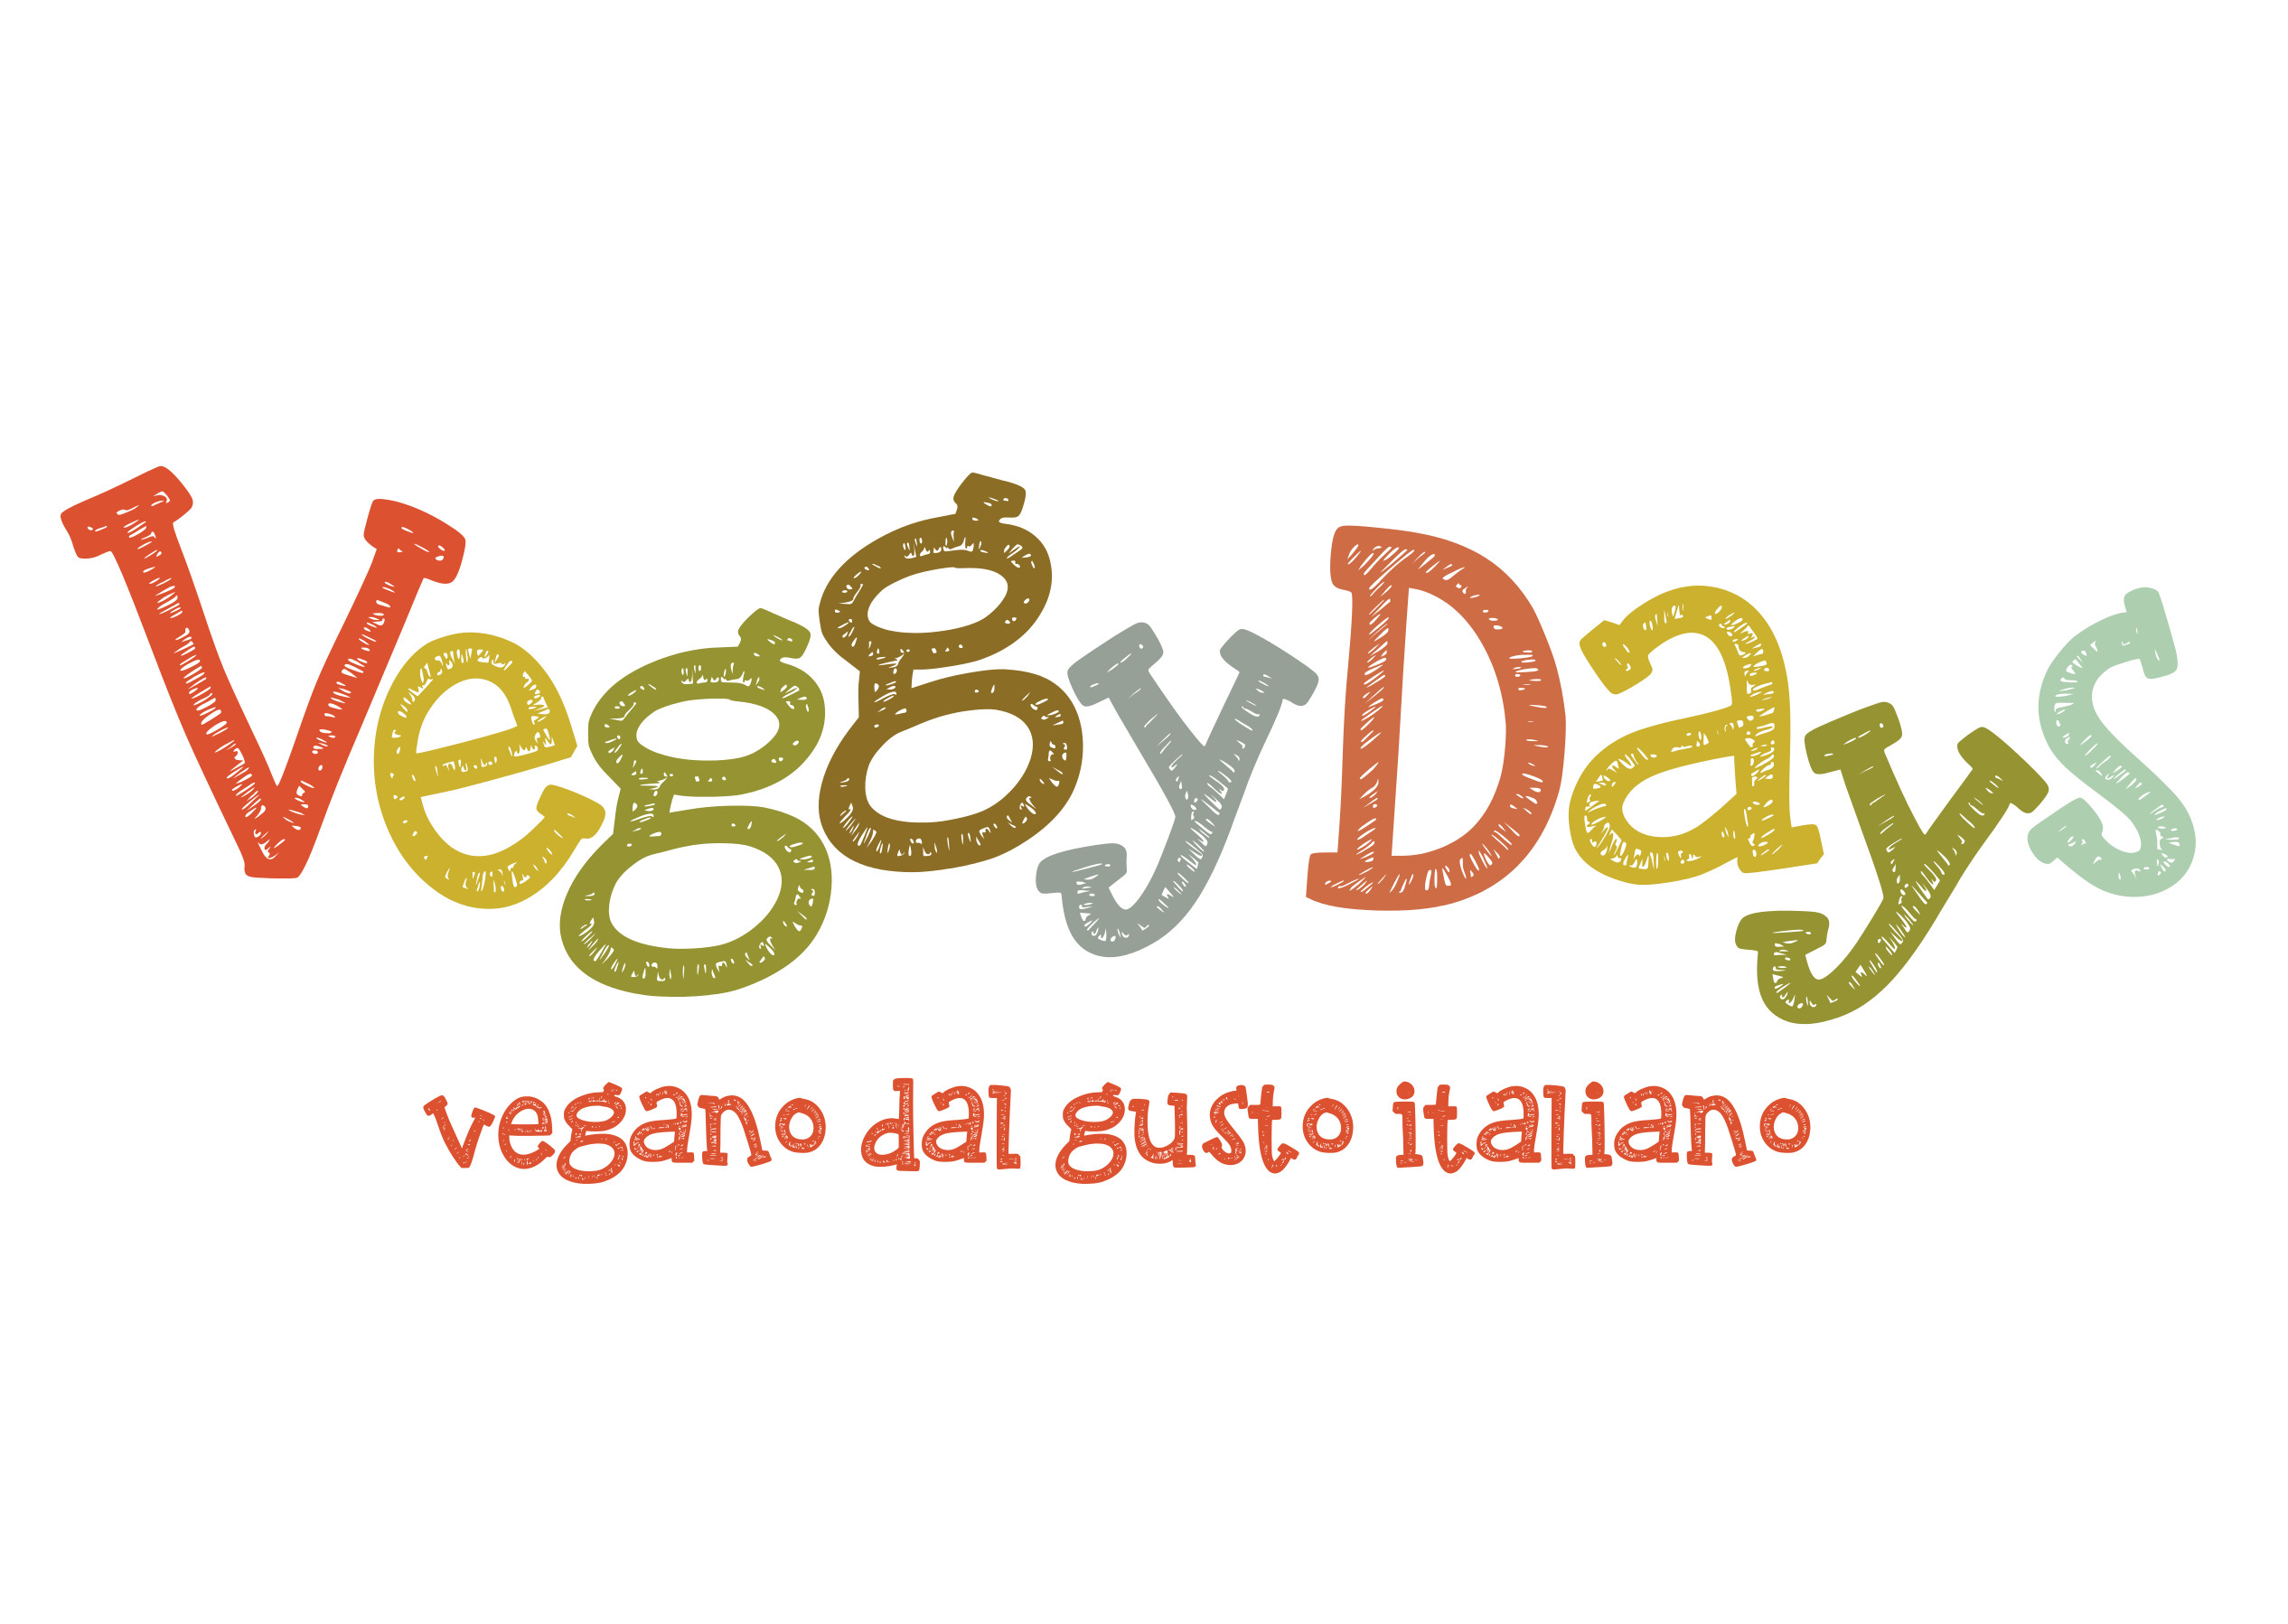 Nuove aperture ristoranti VeggyDays